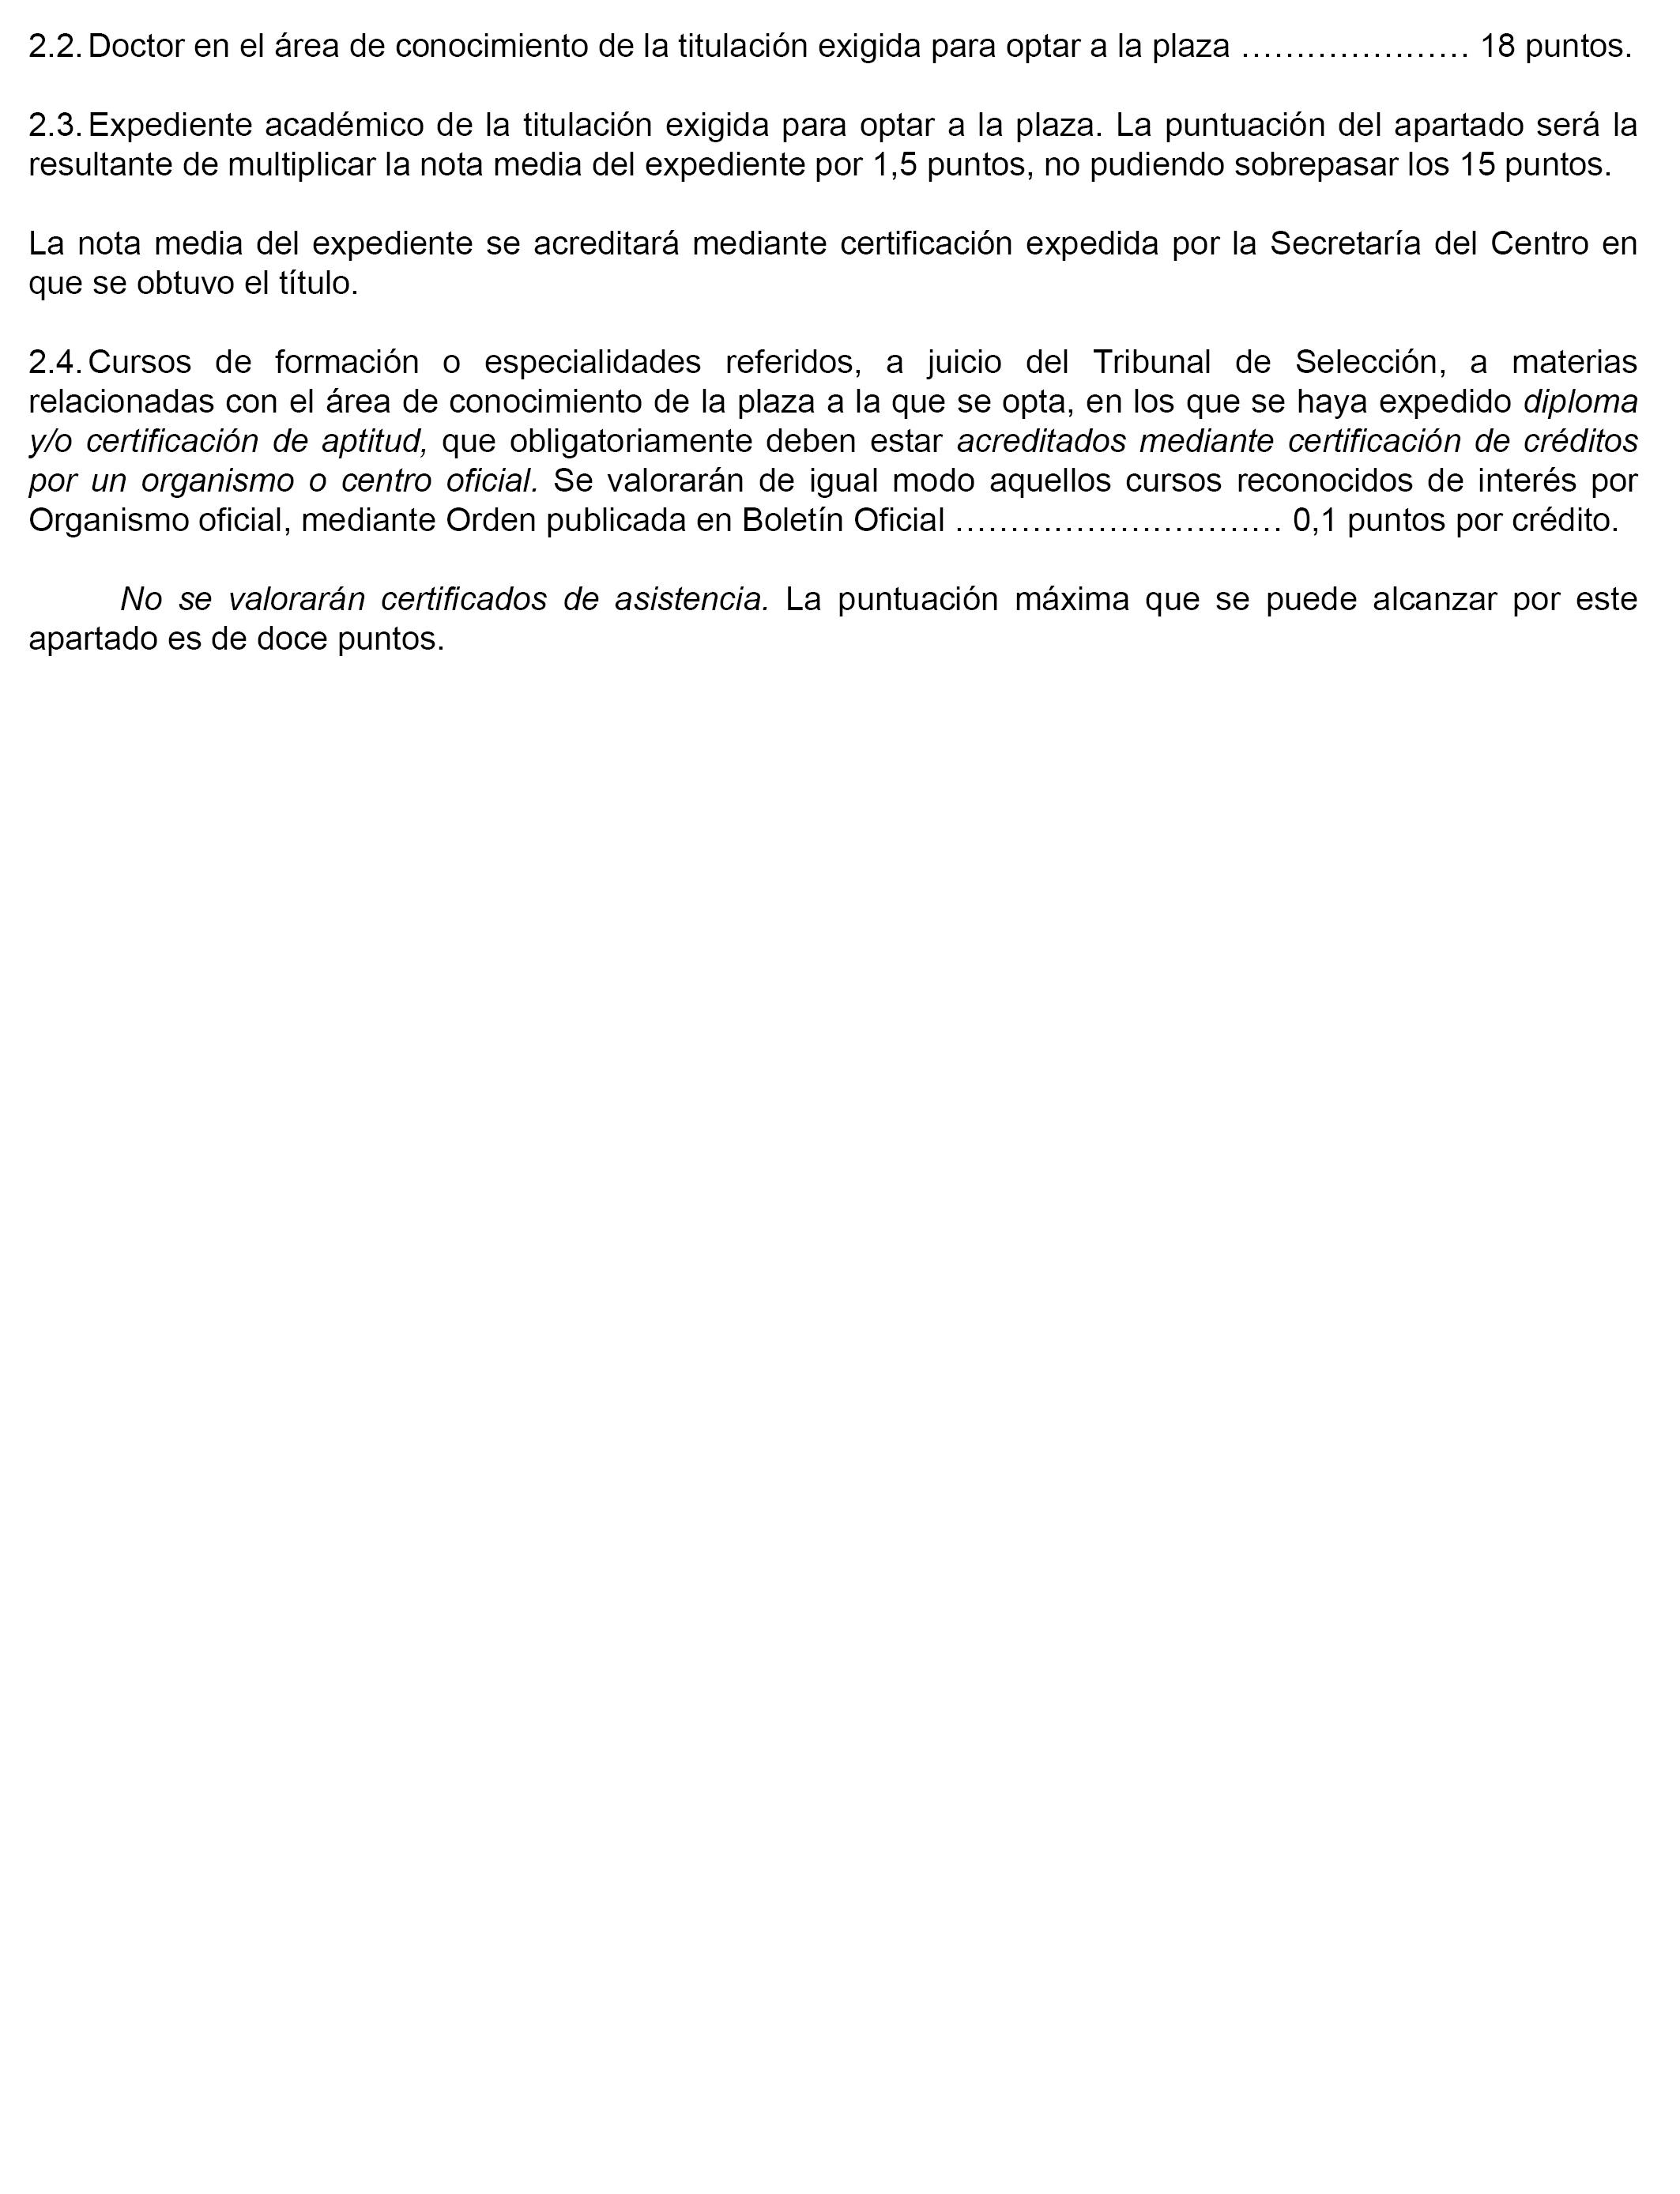 BOE.es - Documento BOE-A-2017-2197